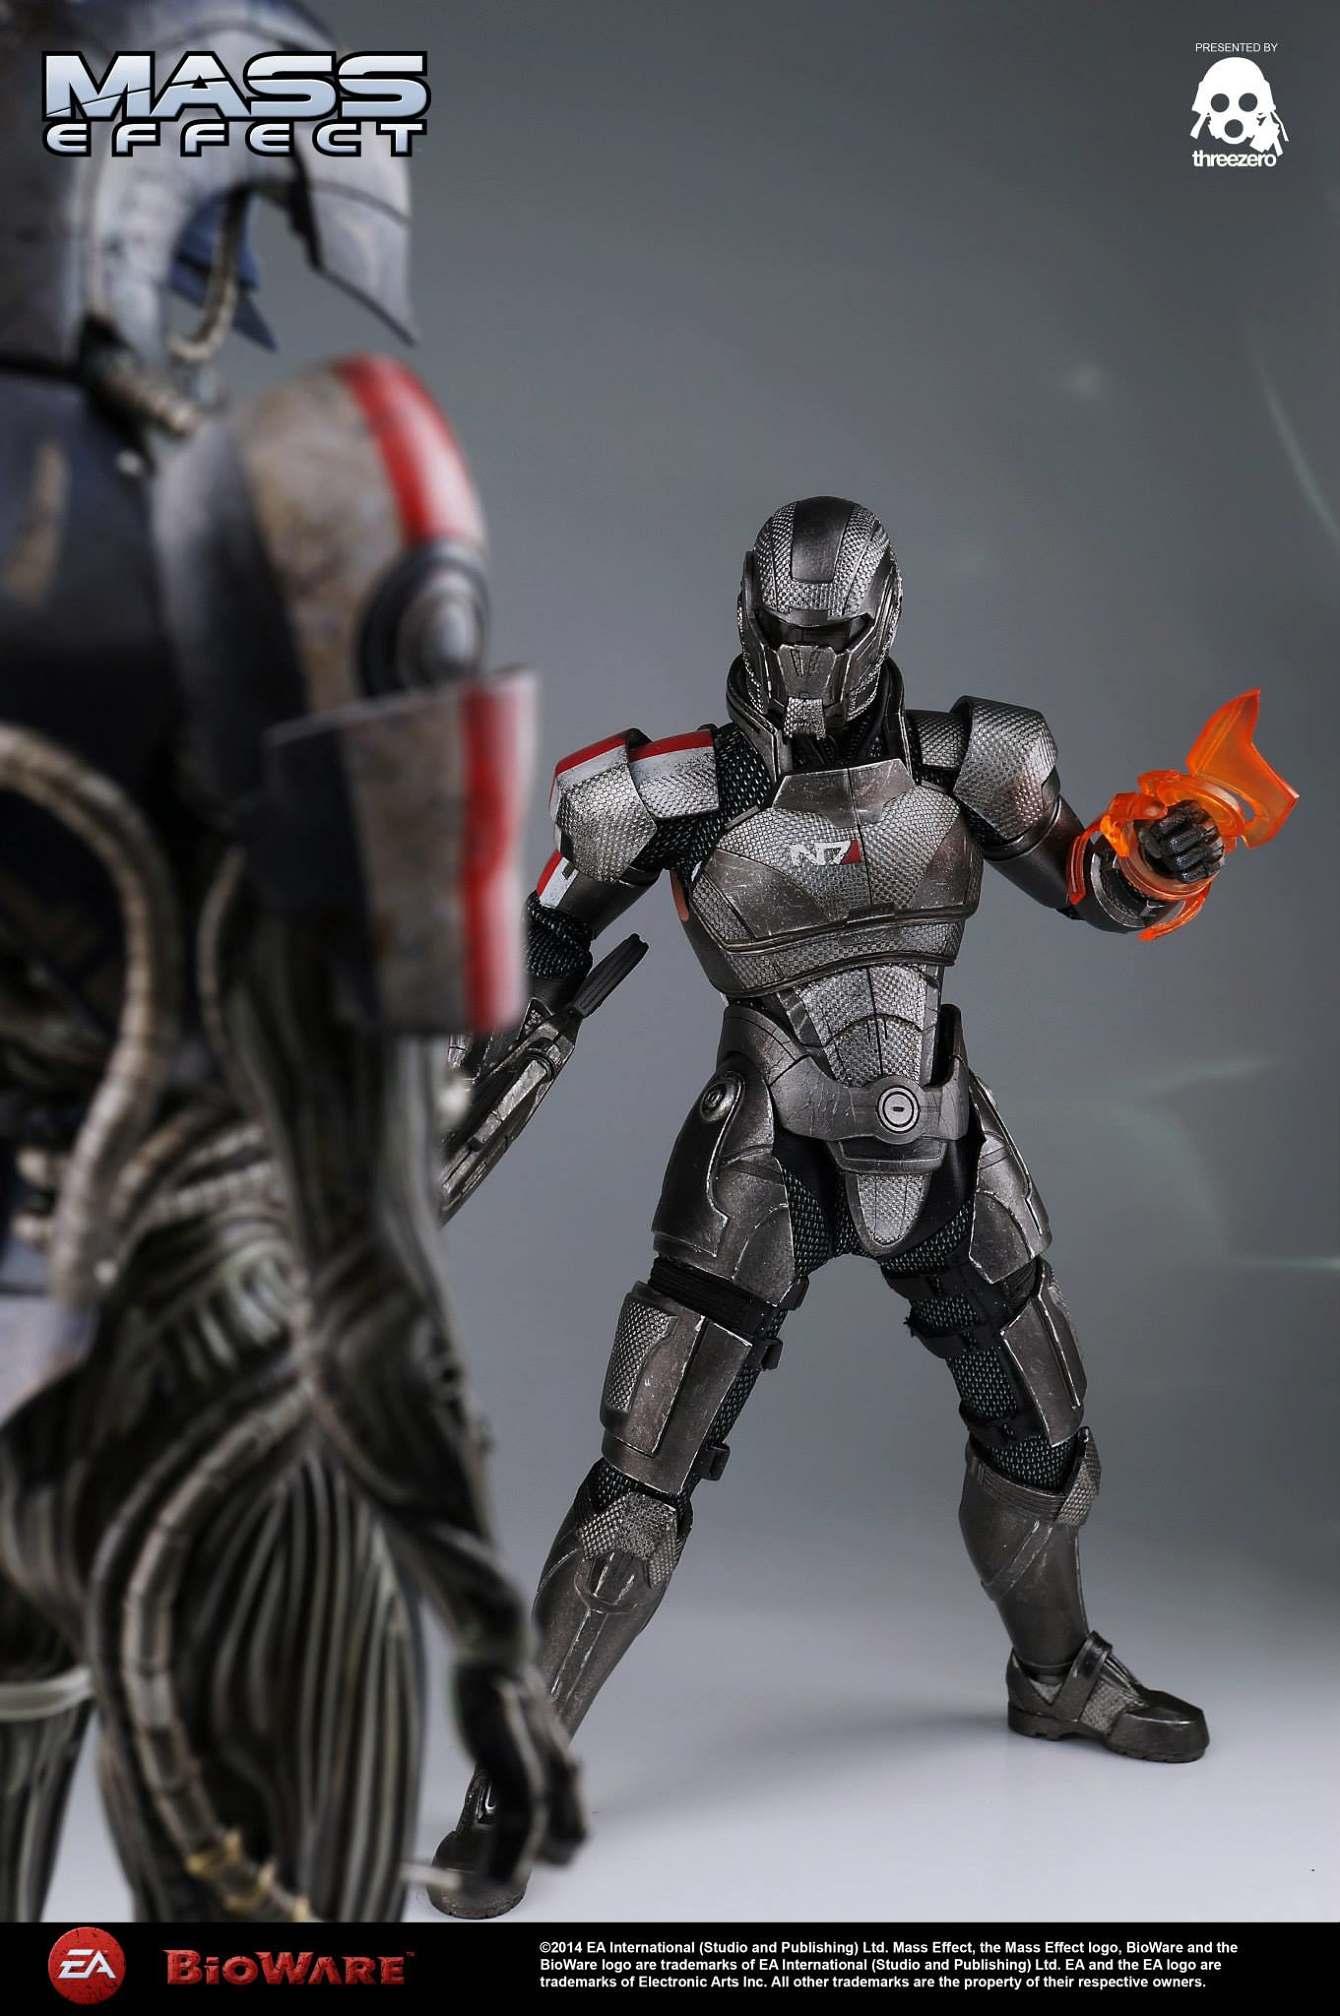 ThreeZero-Bioware-video-game-Shepard-10688475_997492990276529_7022739011171450739_o_1340_c.jpg